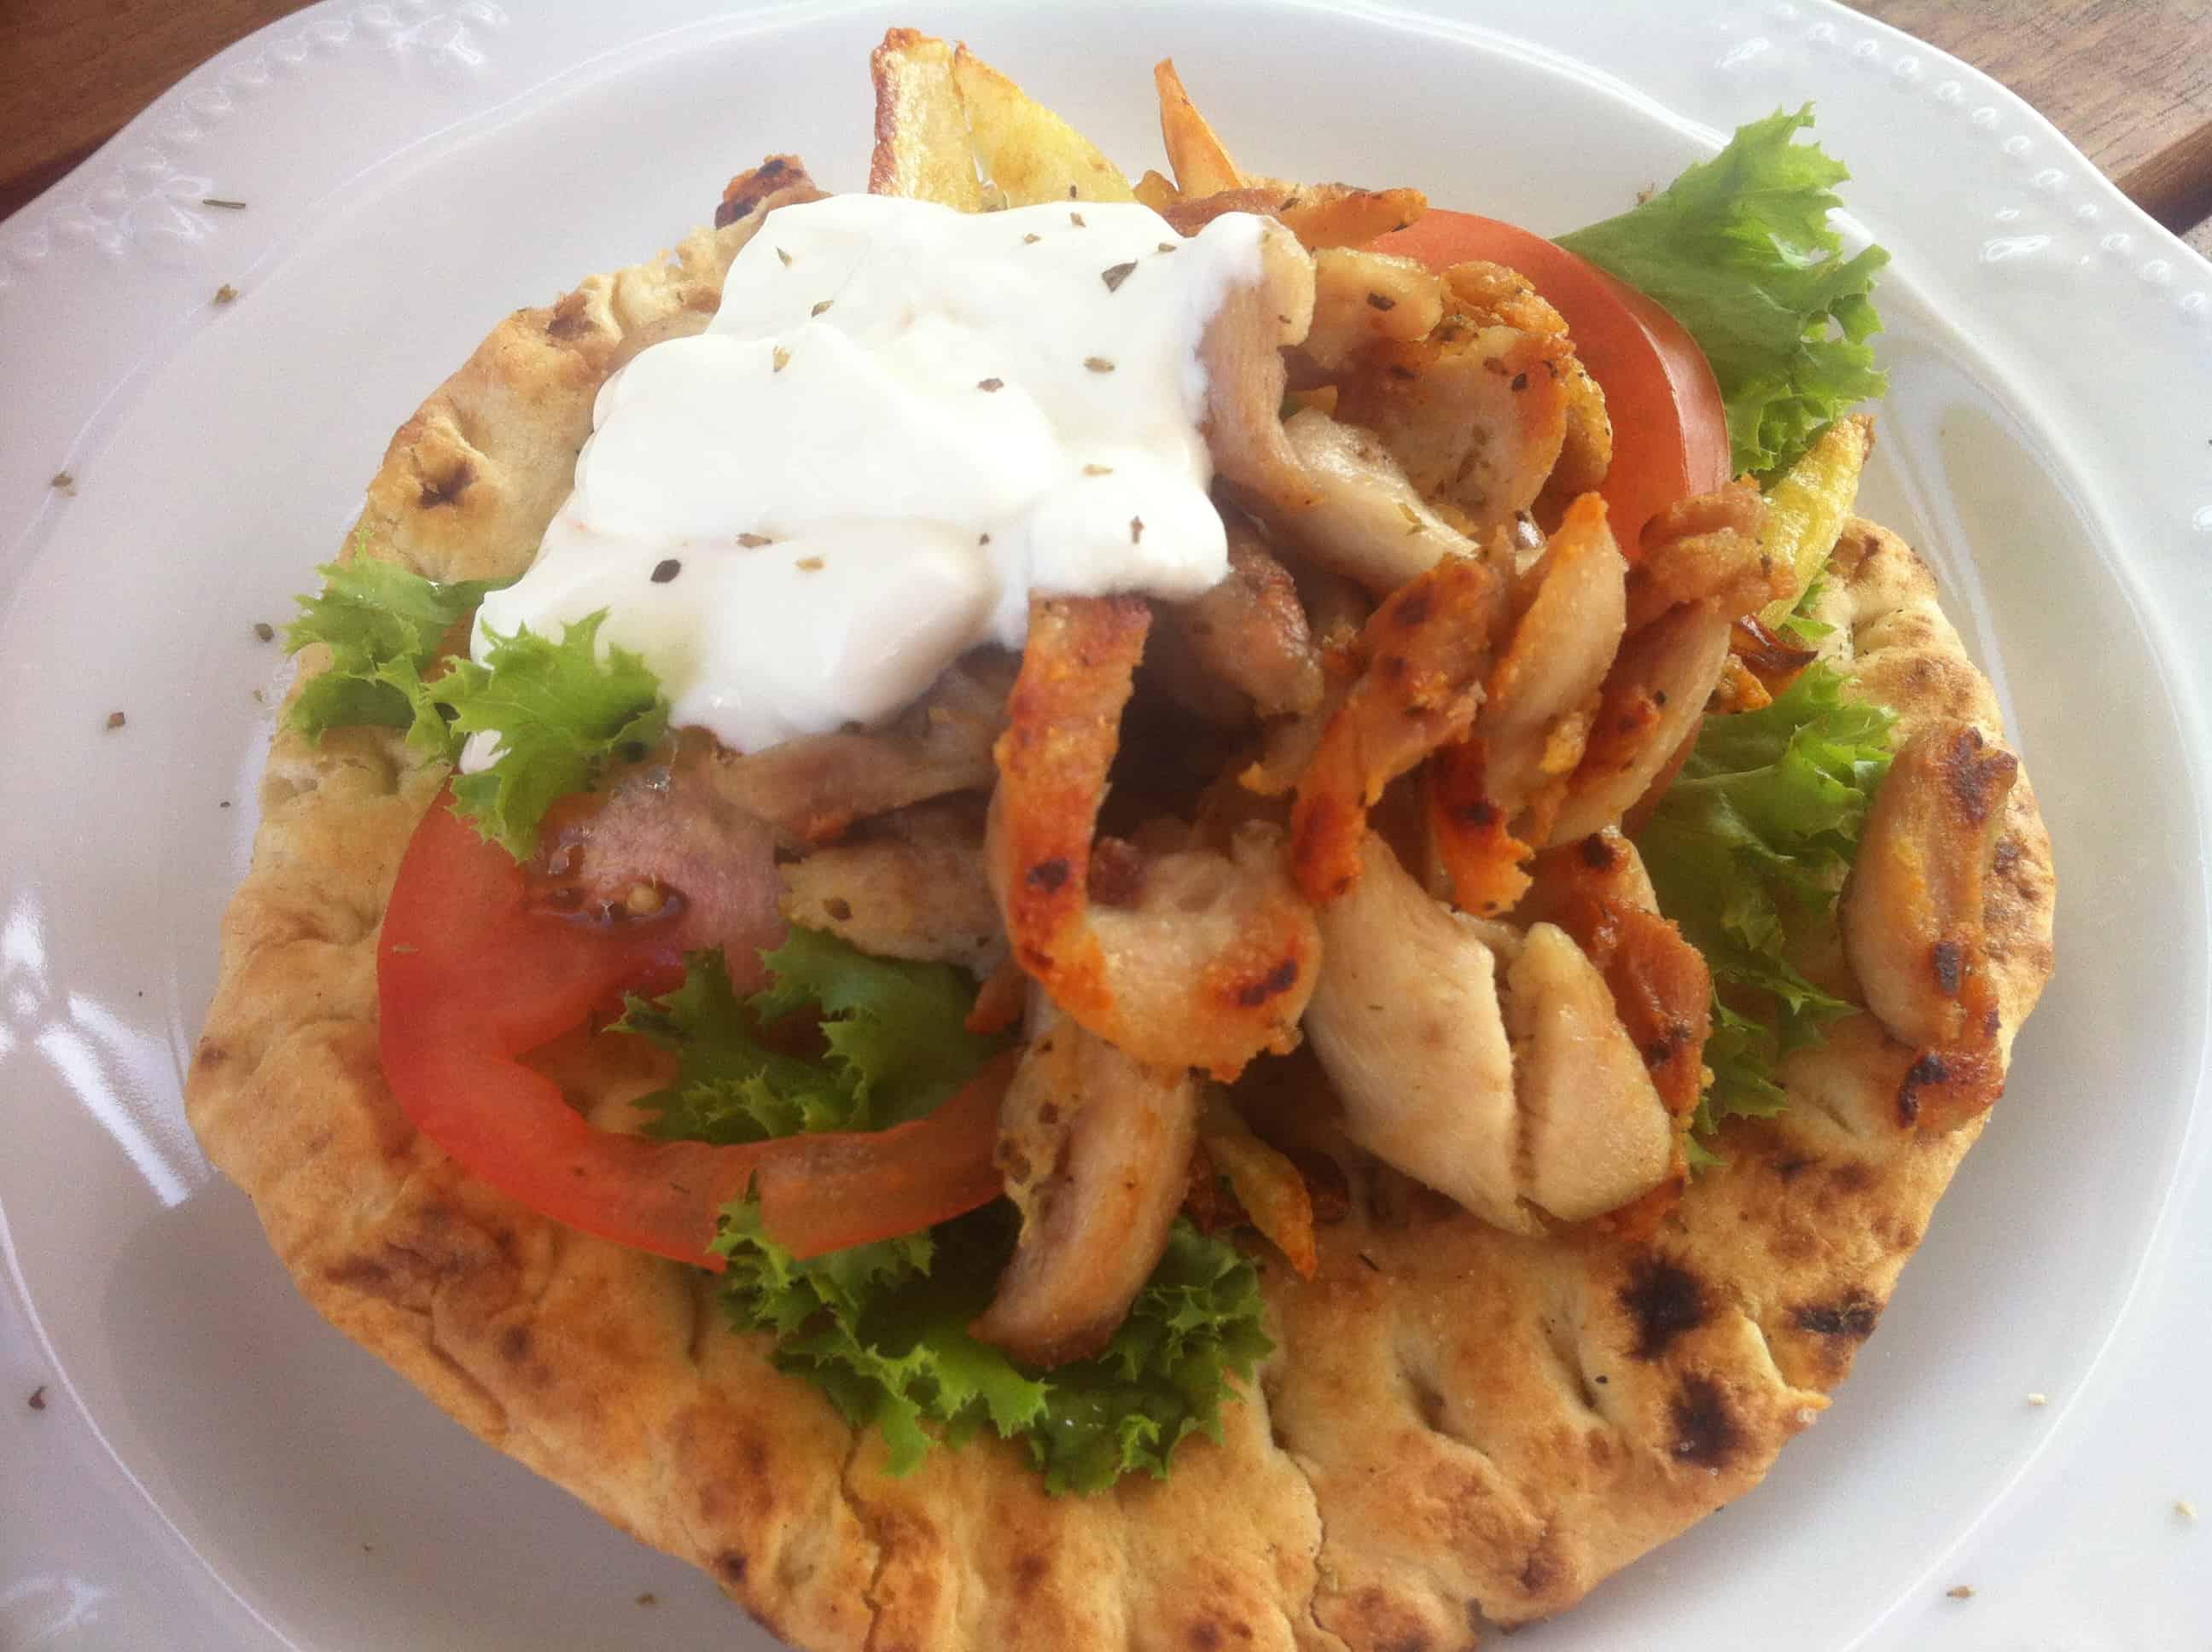 ... chicken souvlaki gyro style chicken souvlaki for chicken gyros juicy